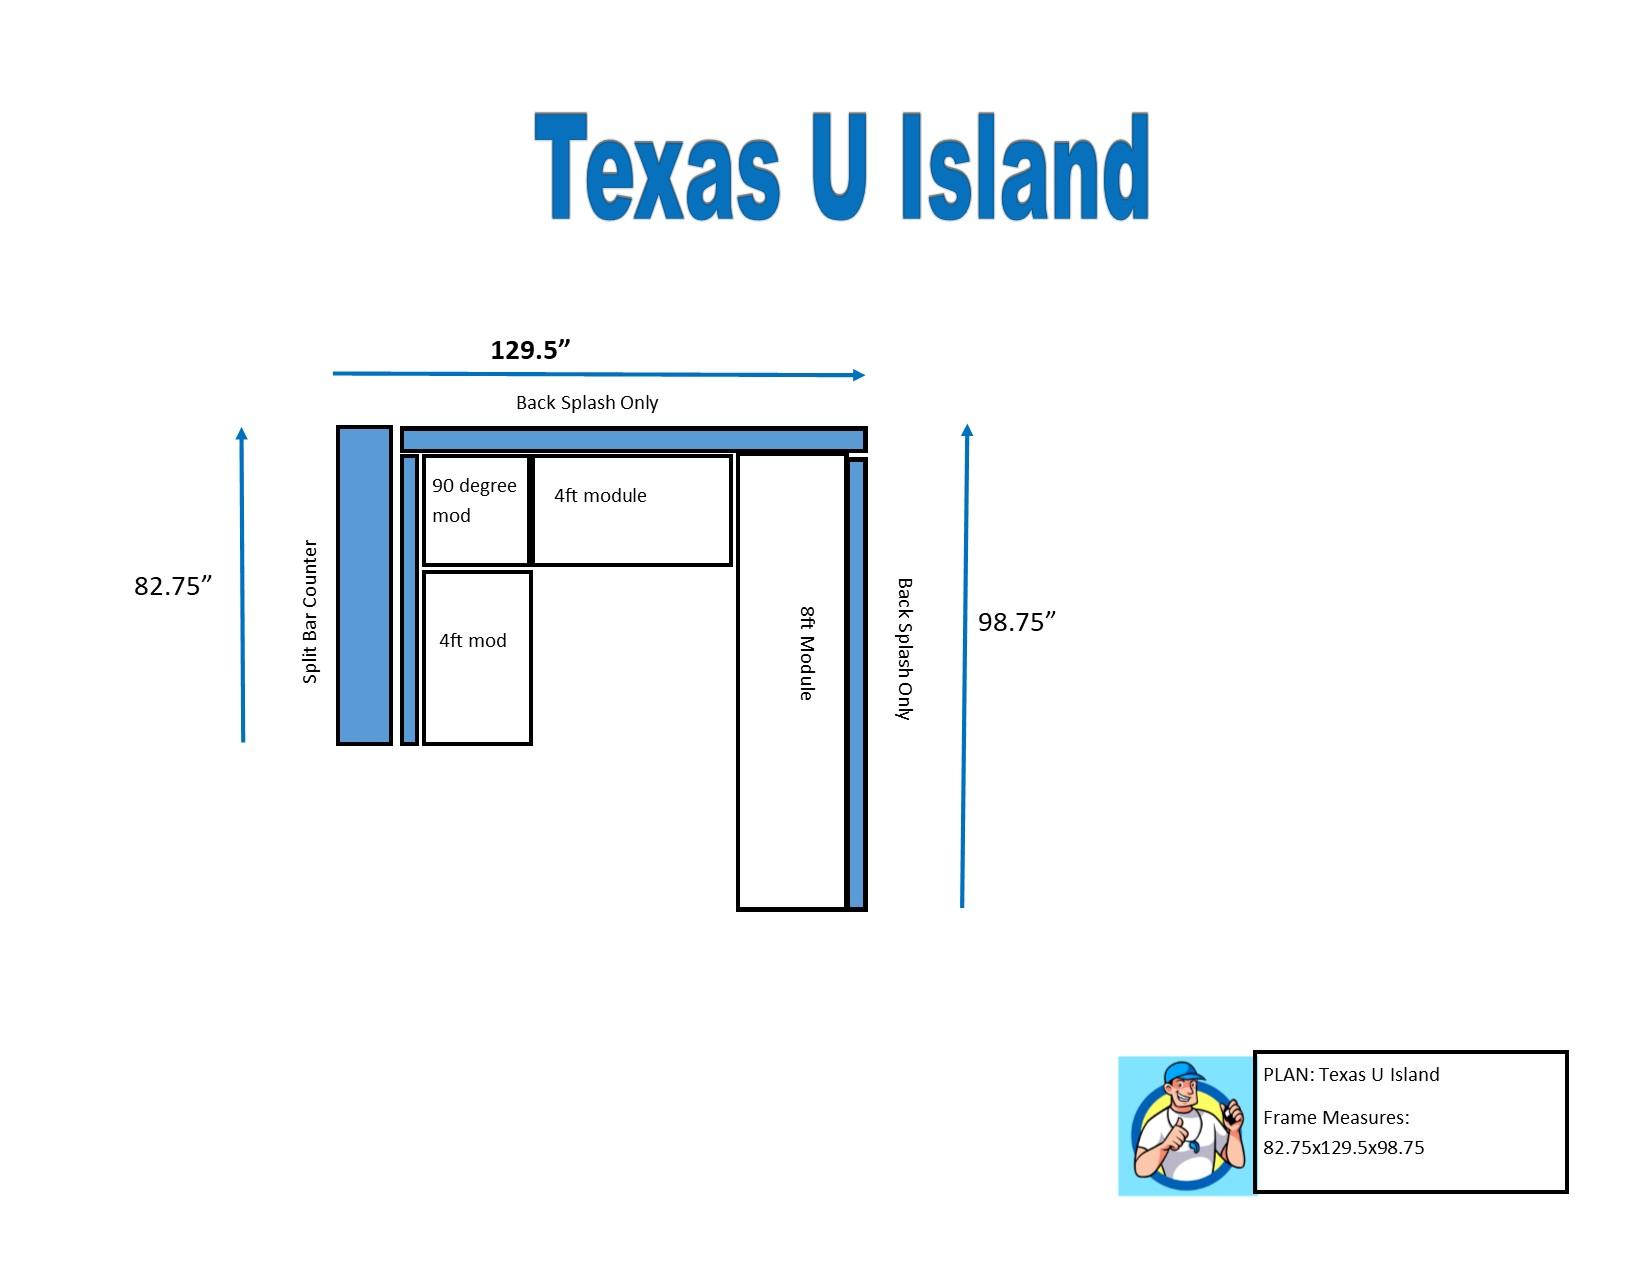 texas-u-island-plan.jpg